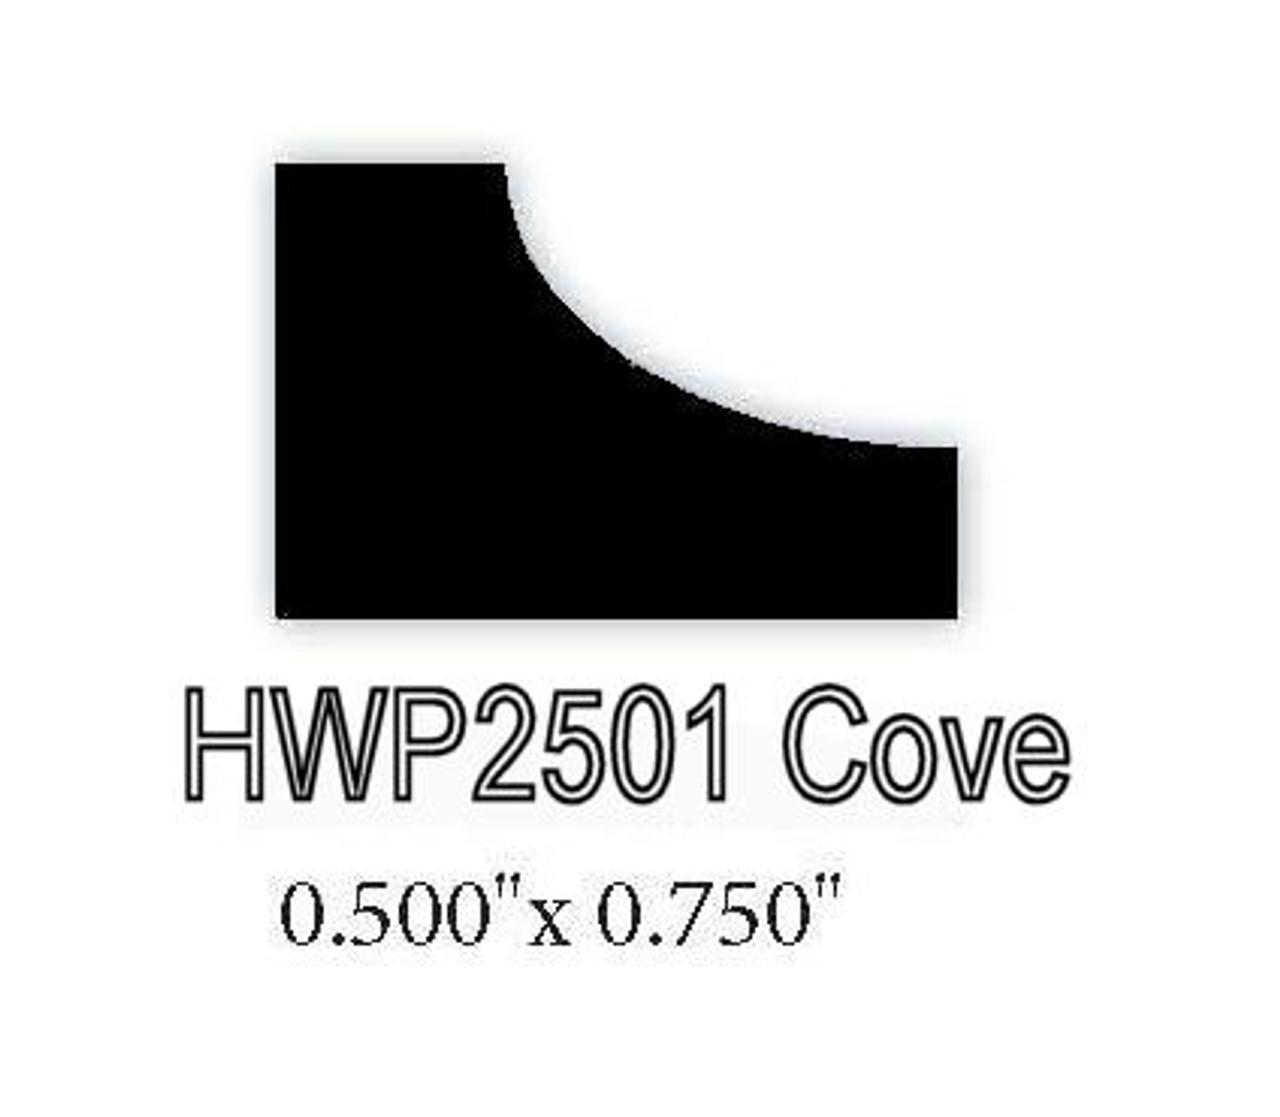 "2501 1/2"" x 3/4"" Cove Molding"